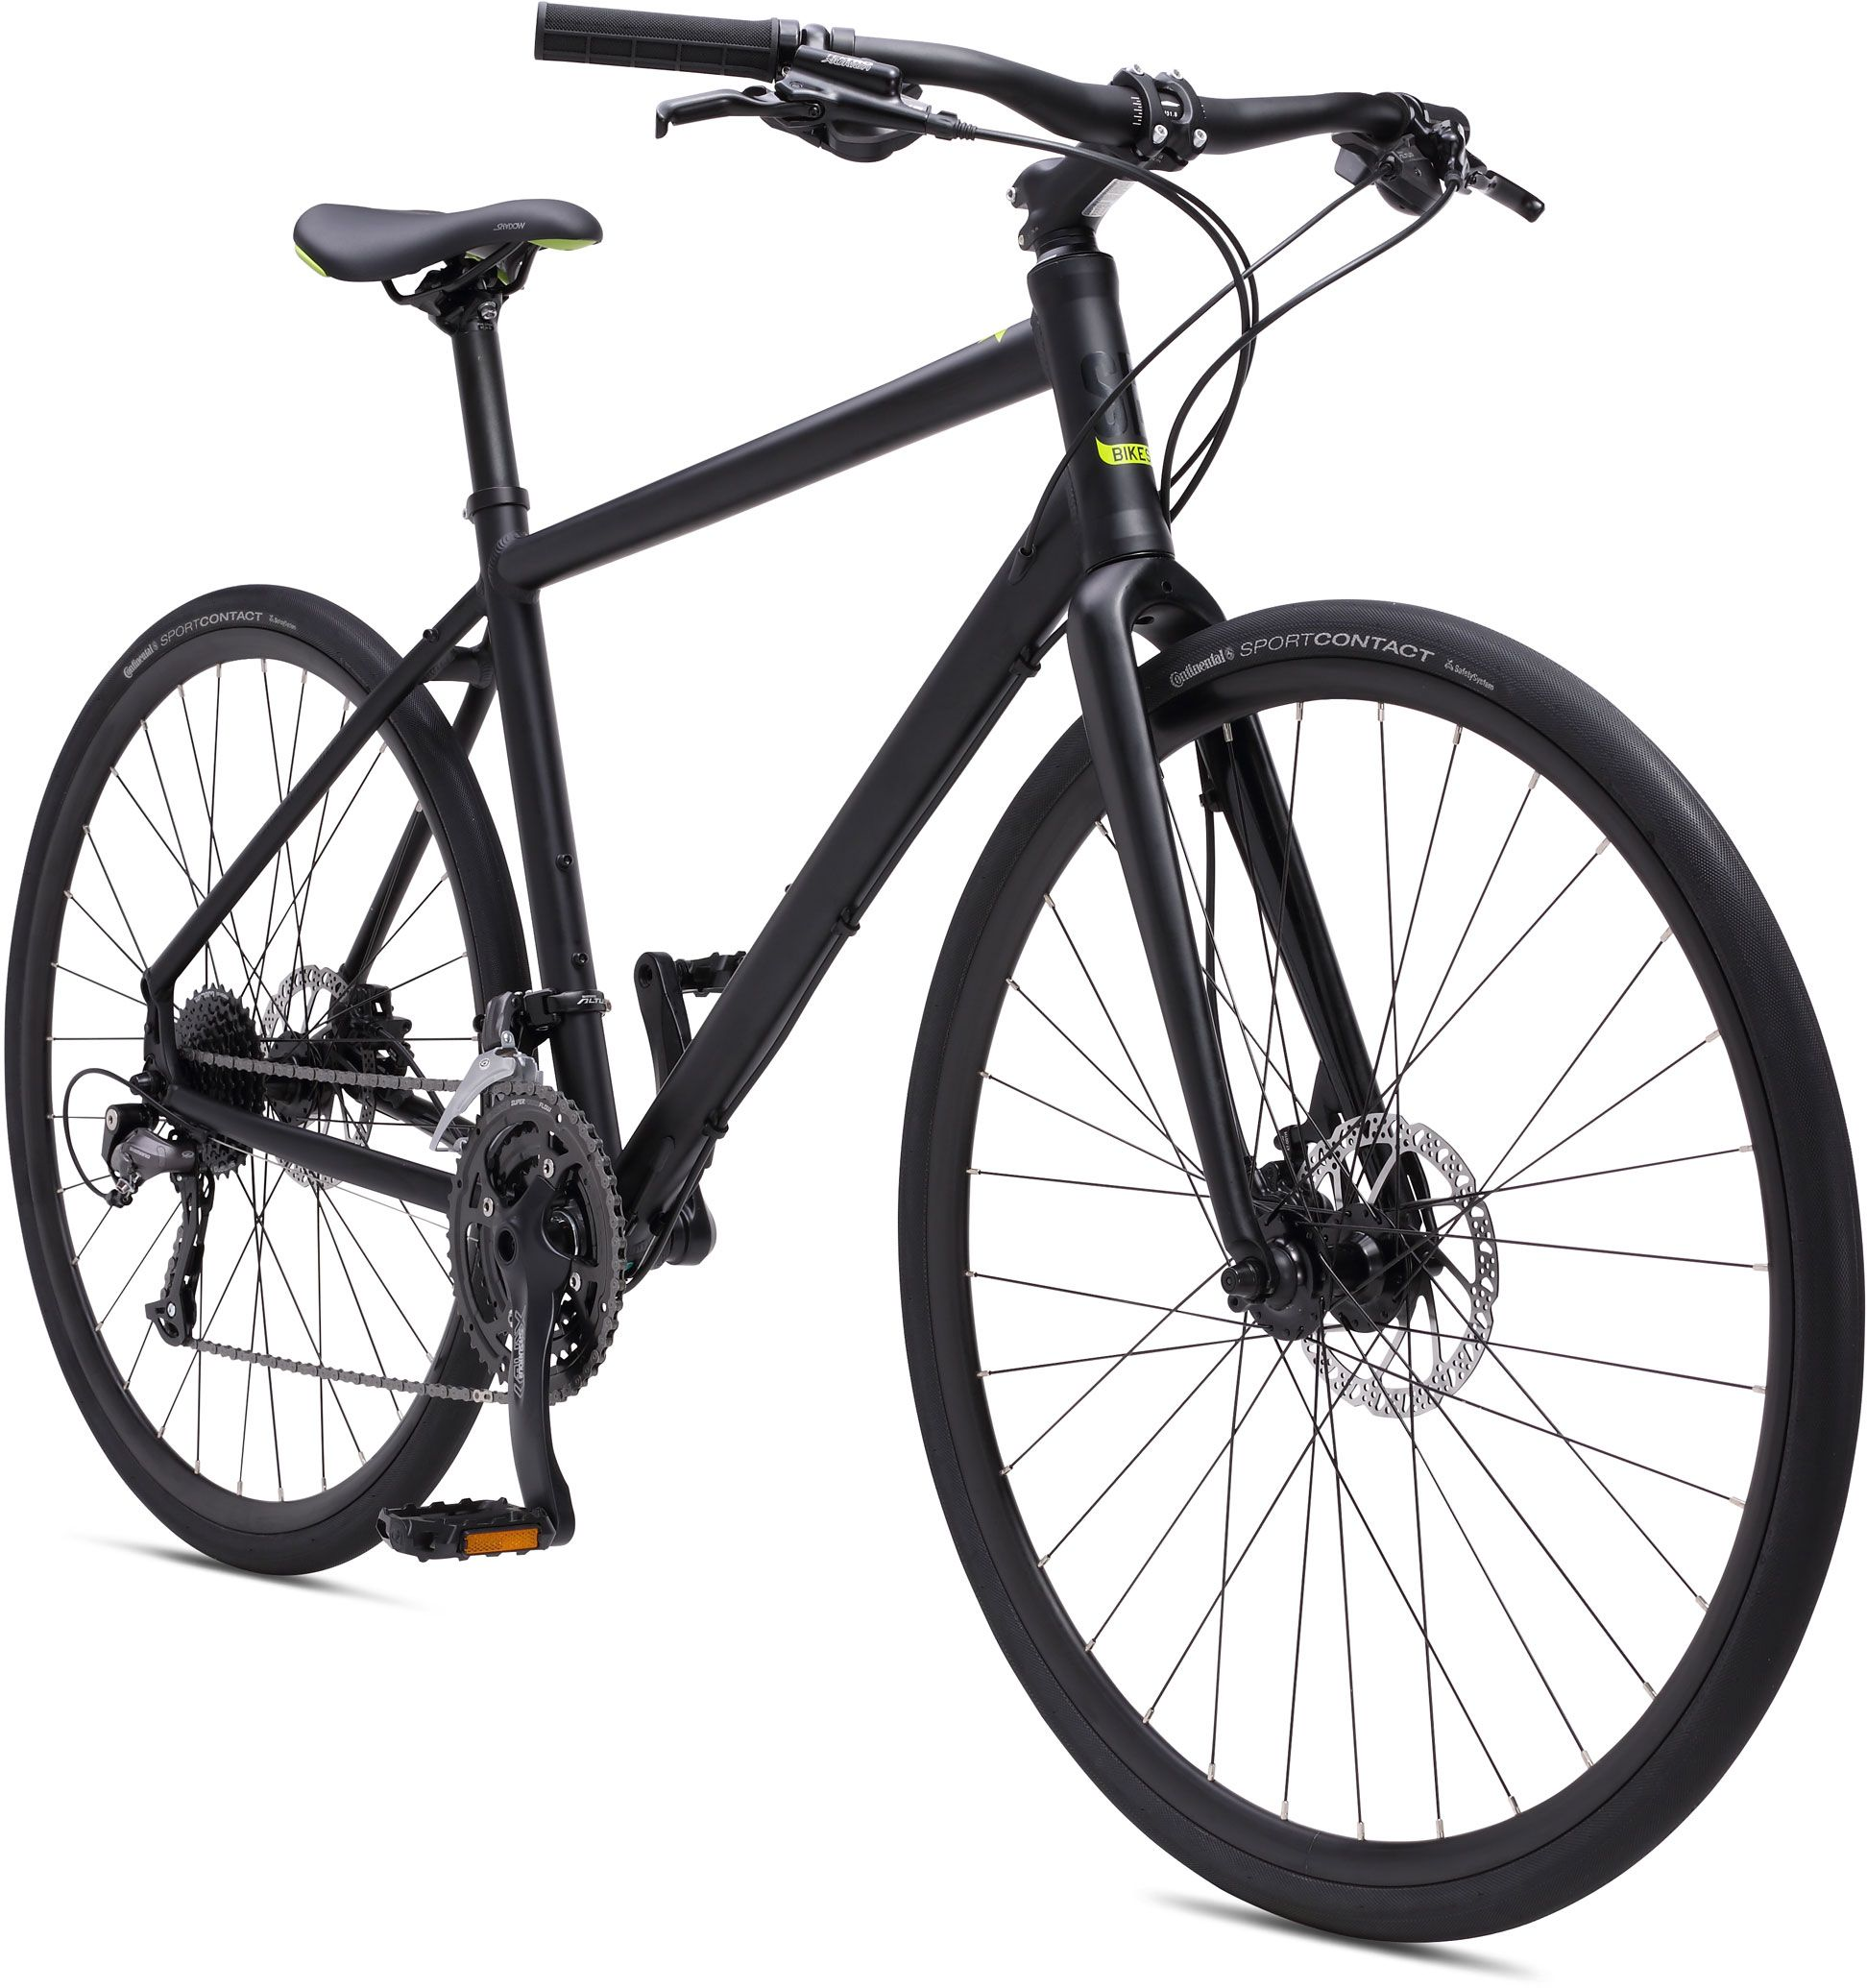 Image Result For Matte Black City Bike Bike Urban Bike City Bike